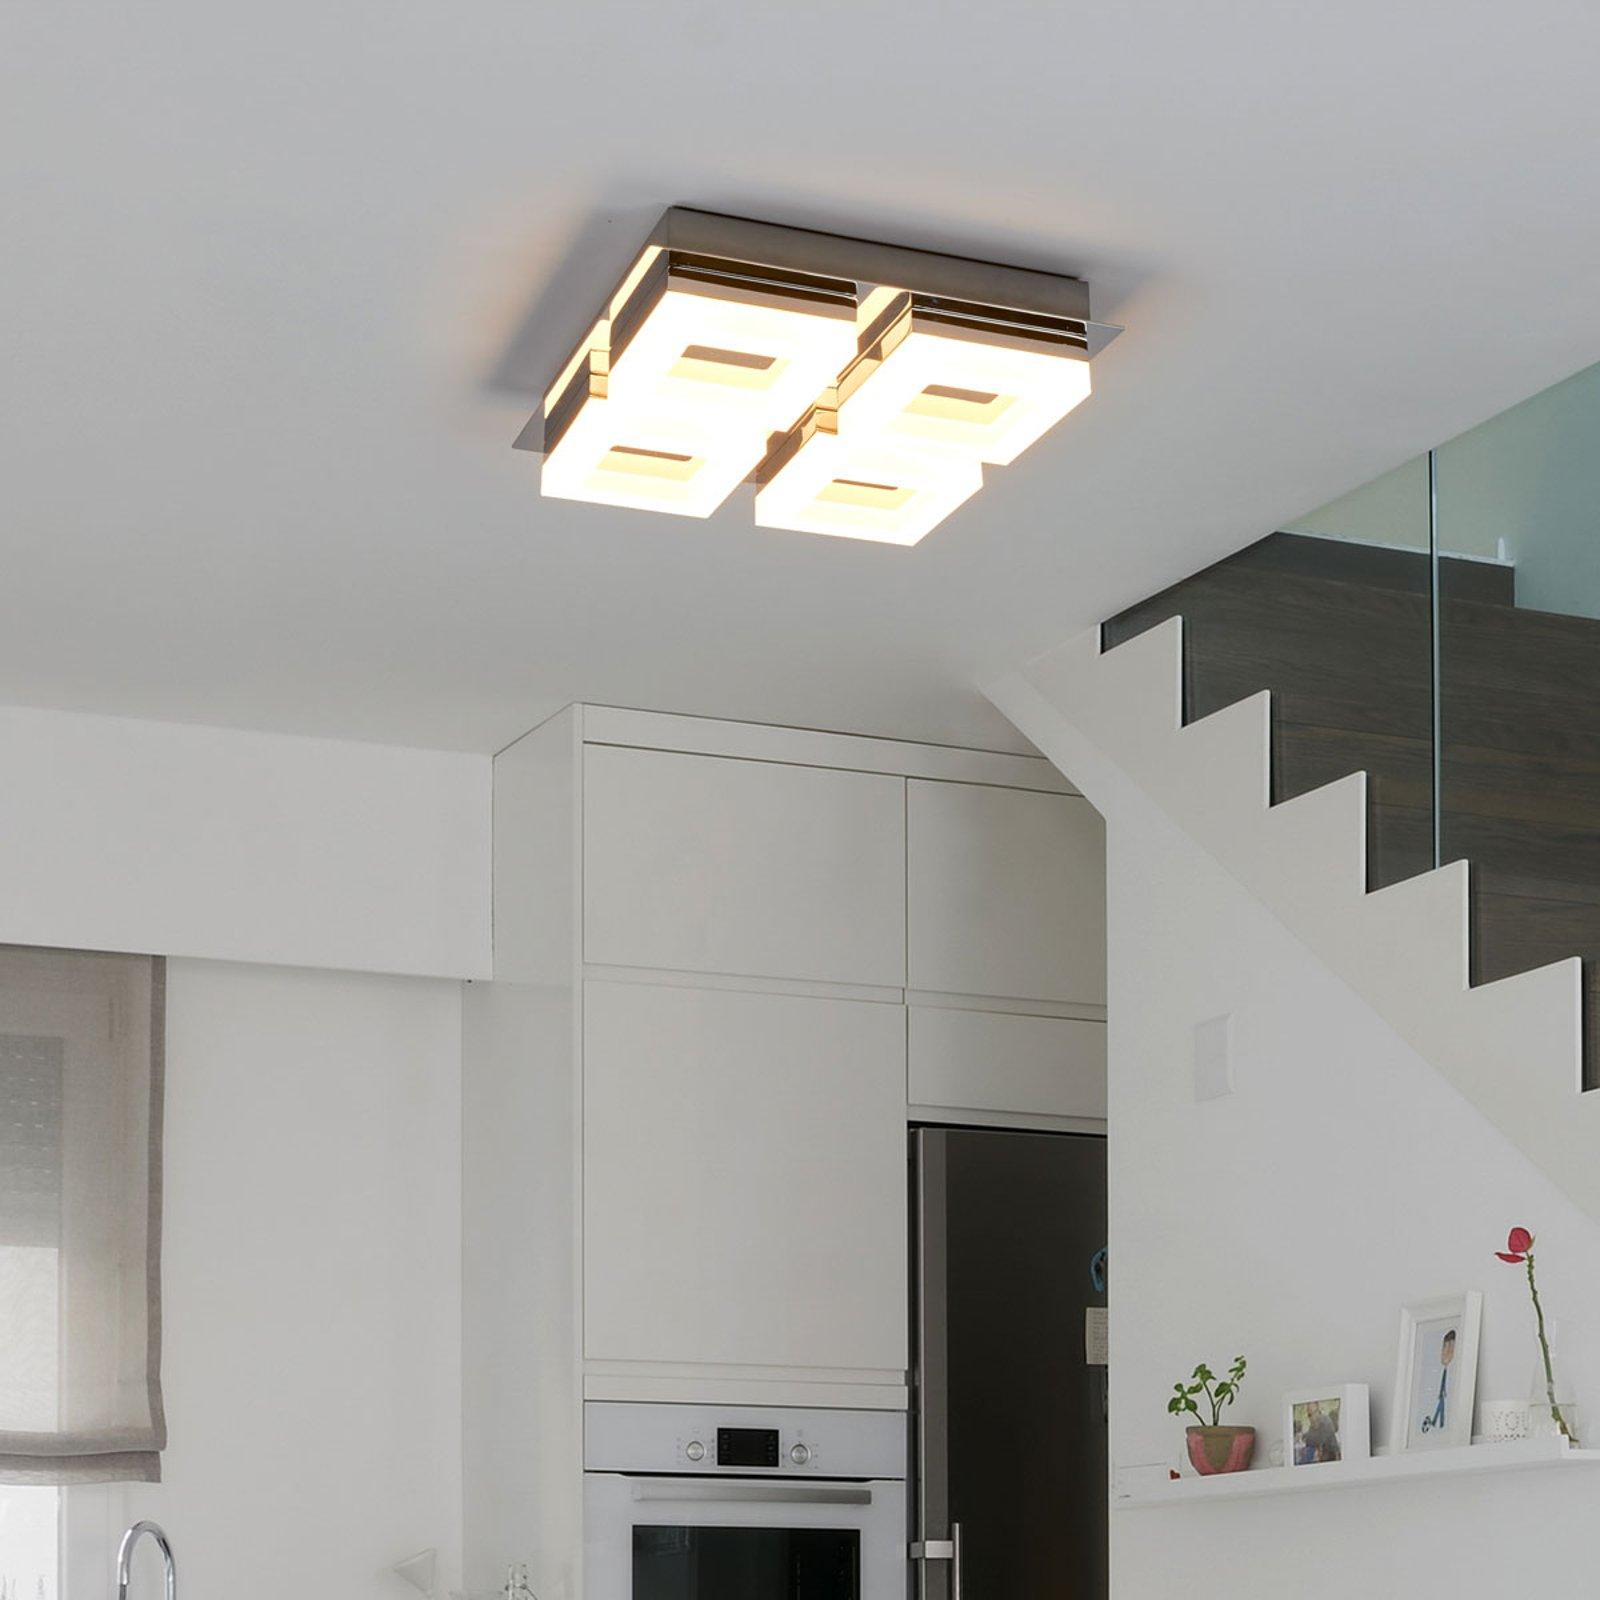 Marija LED-taklampe for baderom med 4 lyskilder